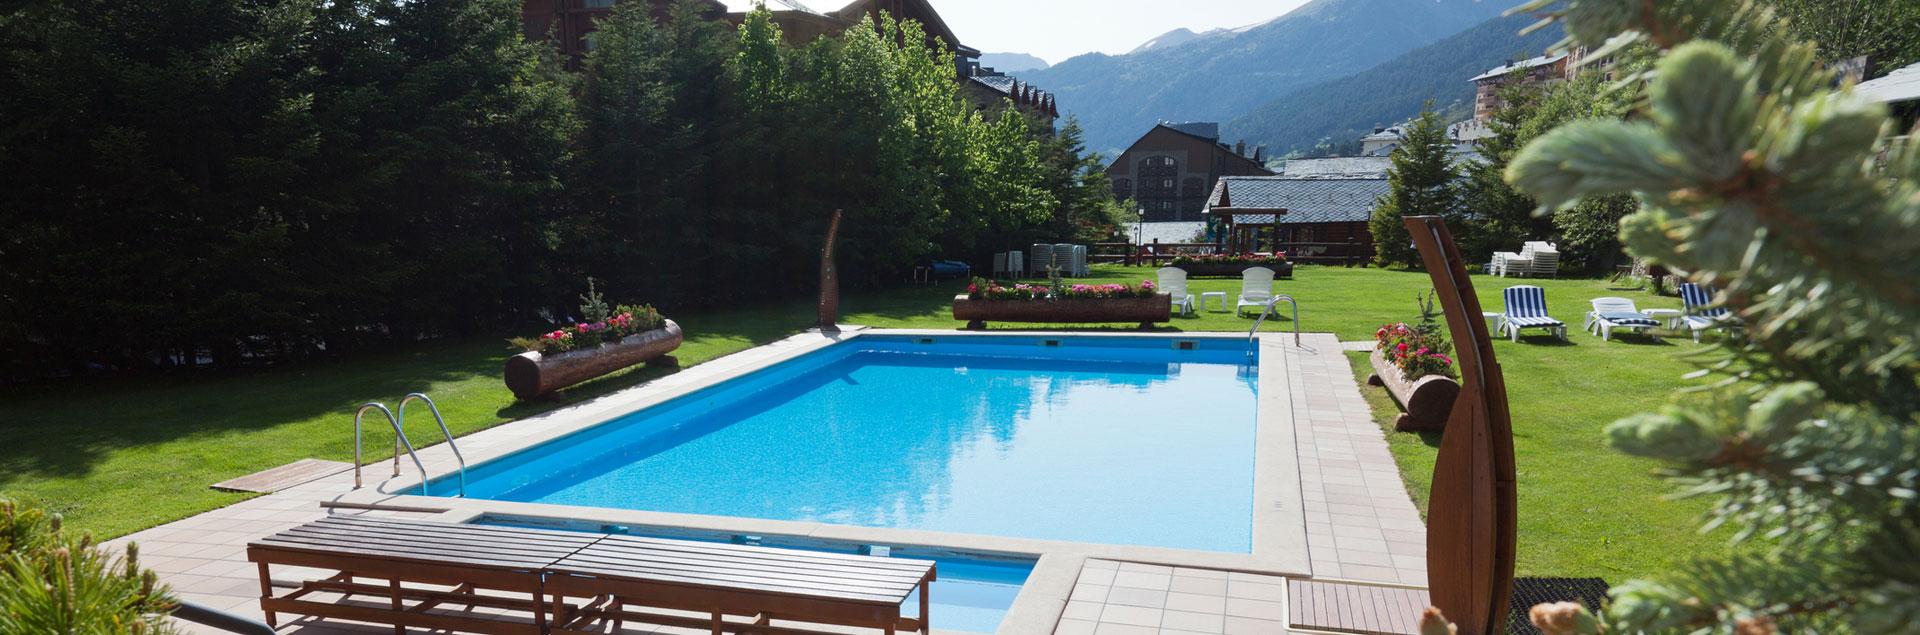 piscine ext rieure sport hotels andorre